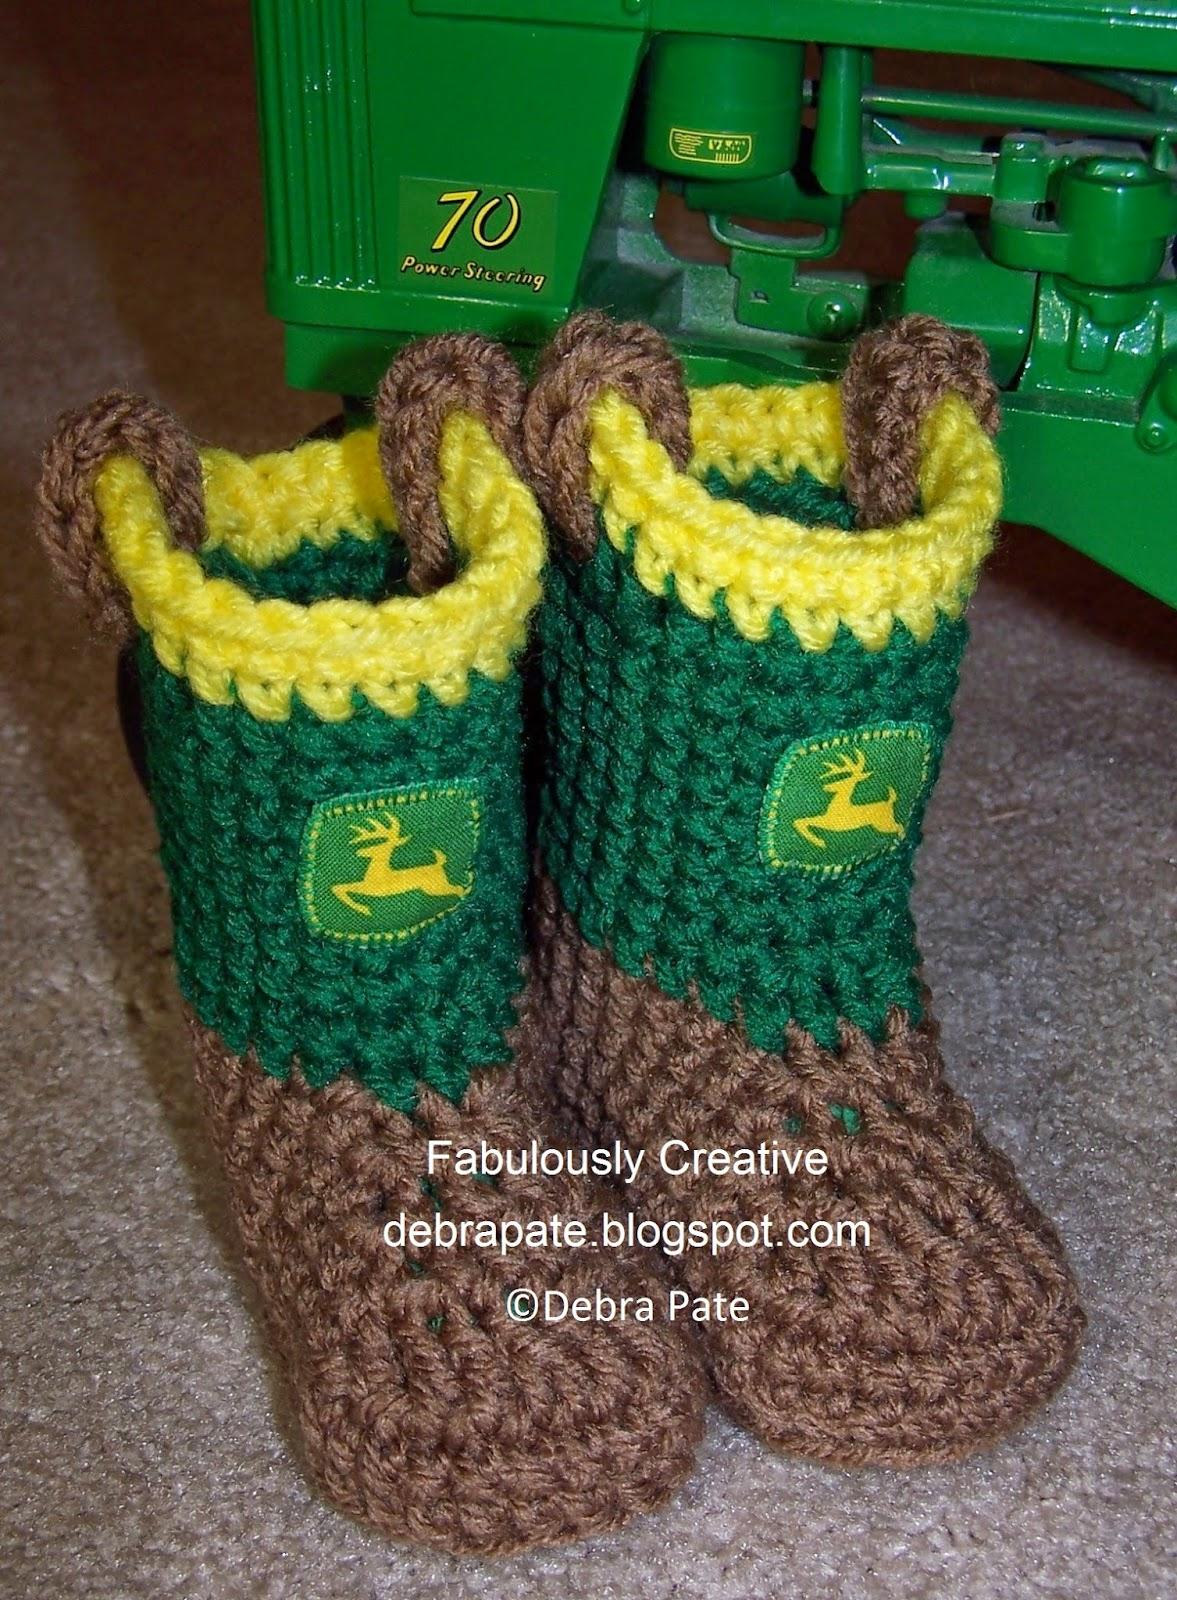 Fabulously Creative Crochet John Deere Tractor Inspired